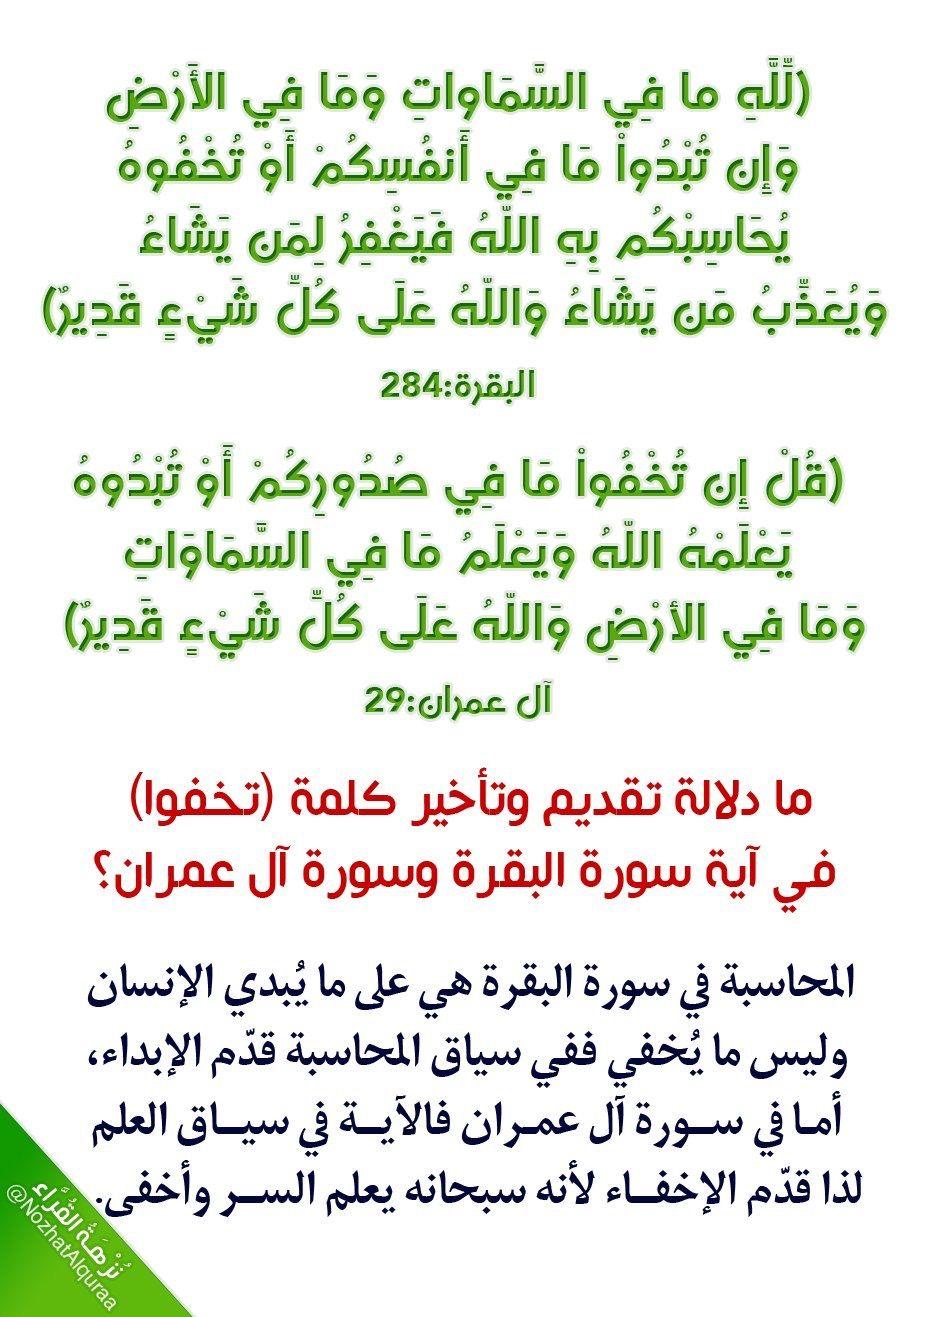 Pin By Eman On ٢ سورة البقرة Quotes Holy Quran Quran